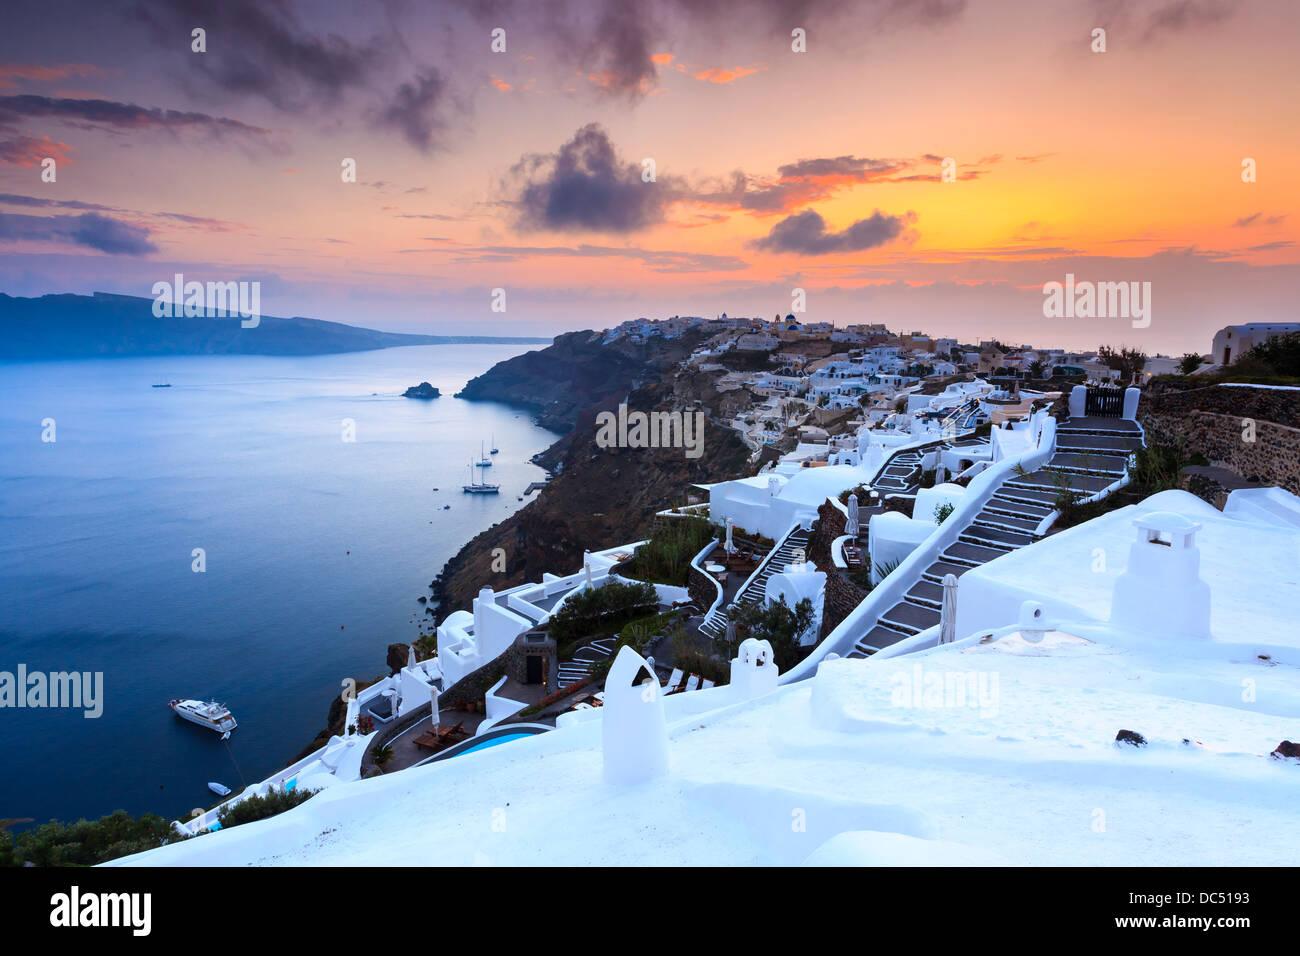 The sun settings over the beautiful village of Oia on the Island of Santorini Greece. - Stock Image